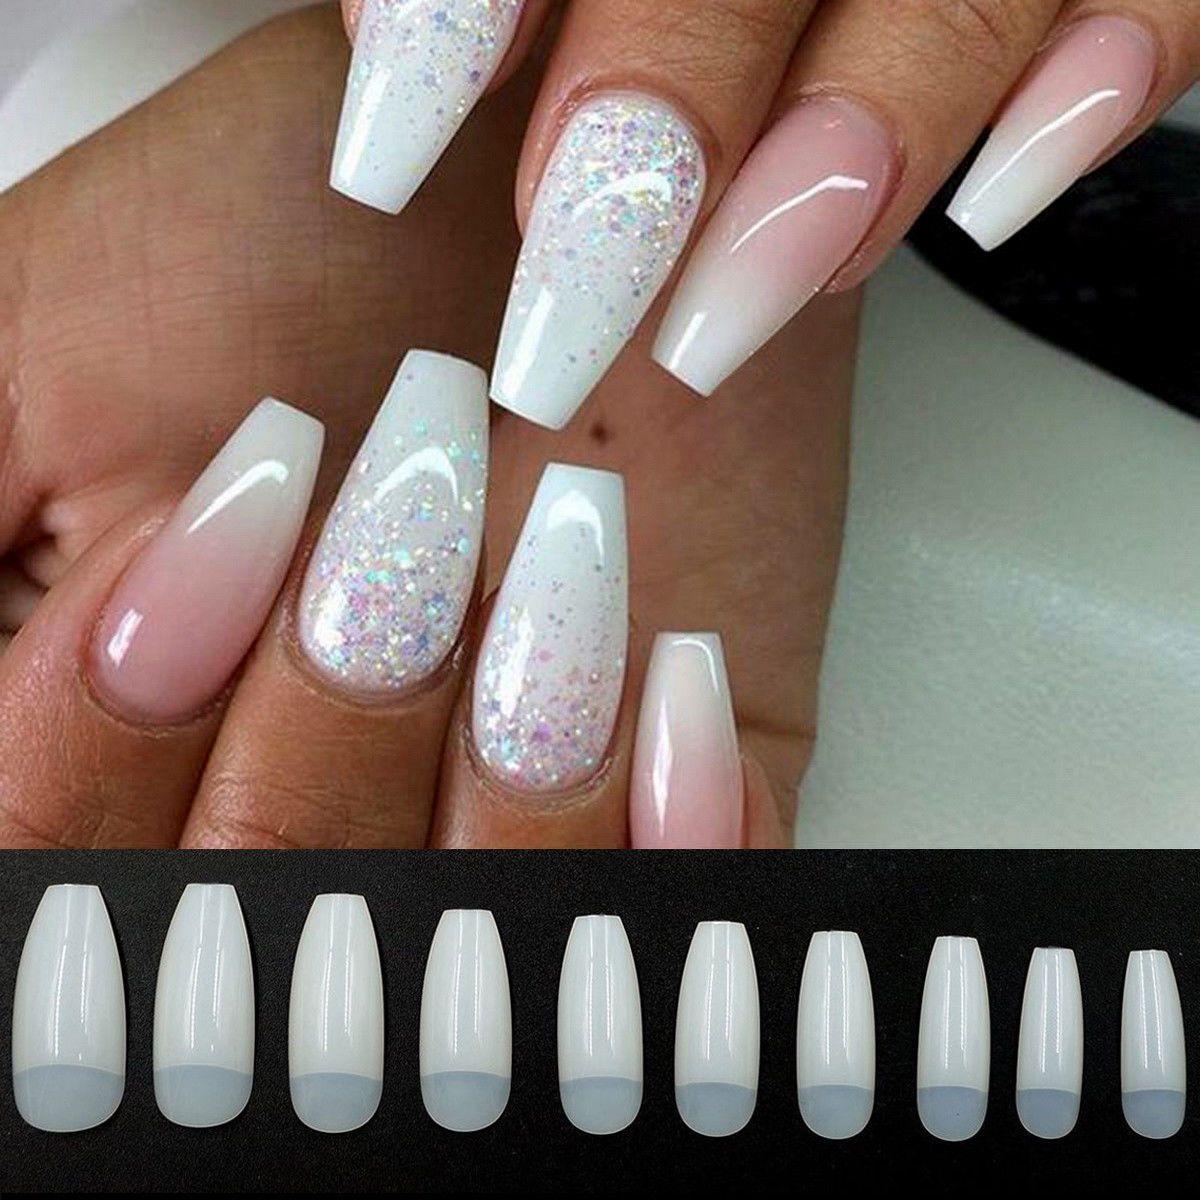 Acrylic Nails Glitter Tips Designs 24 1 In 2020 Glitter Nails Acrylic Blue Glitter Nails Homecoming Nails Acrylic